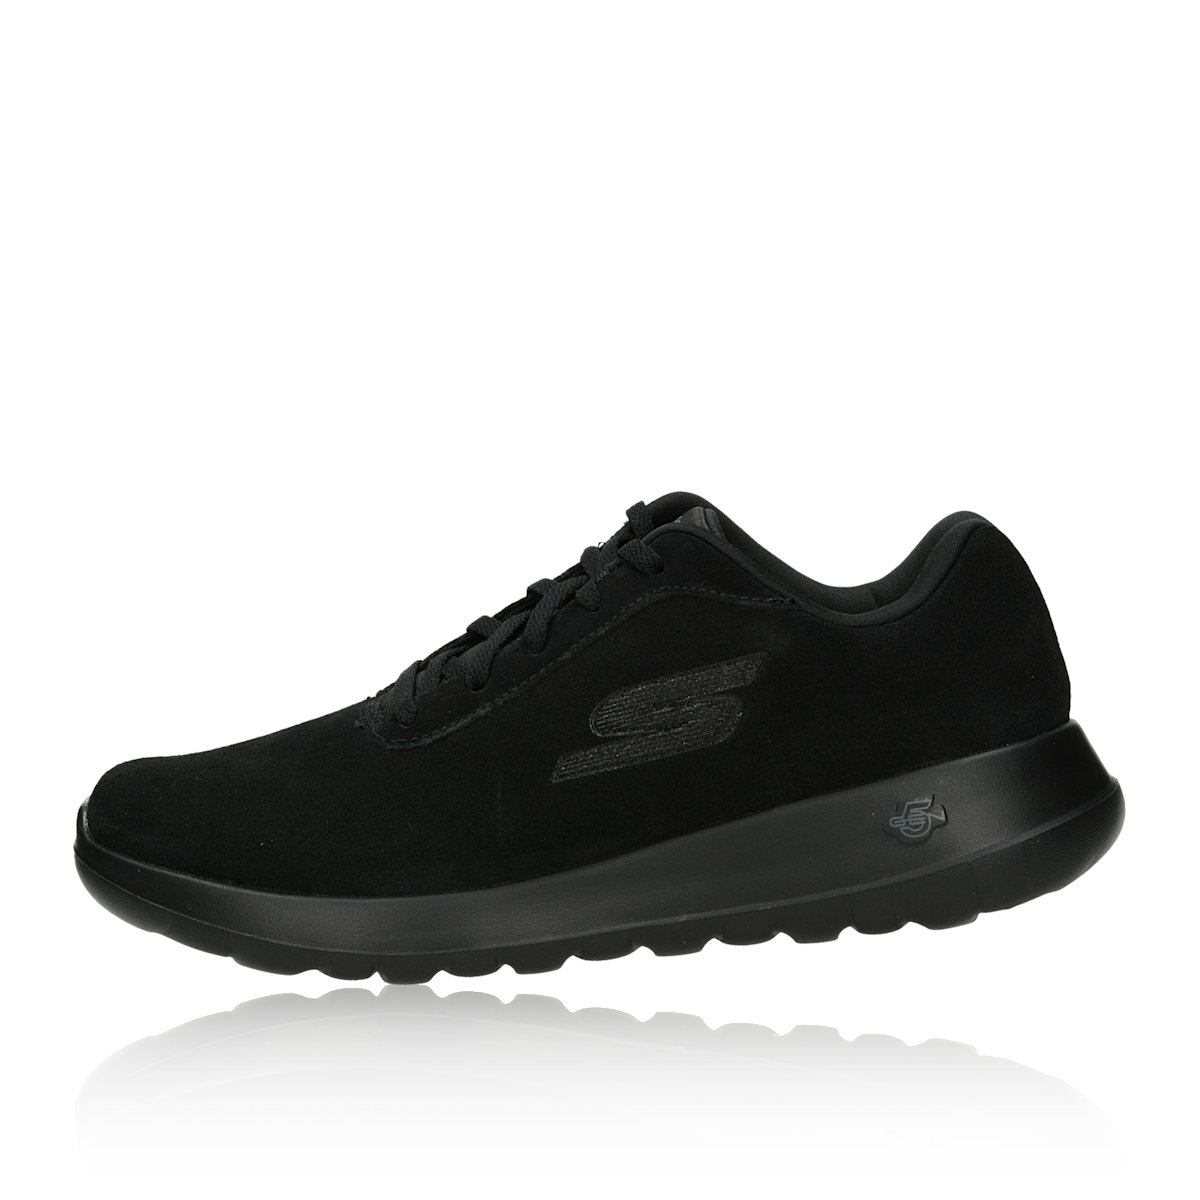 Skechers pánske štýlové tenisky - čierne